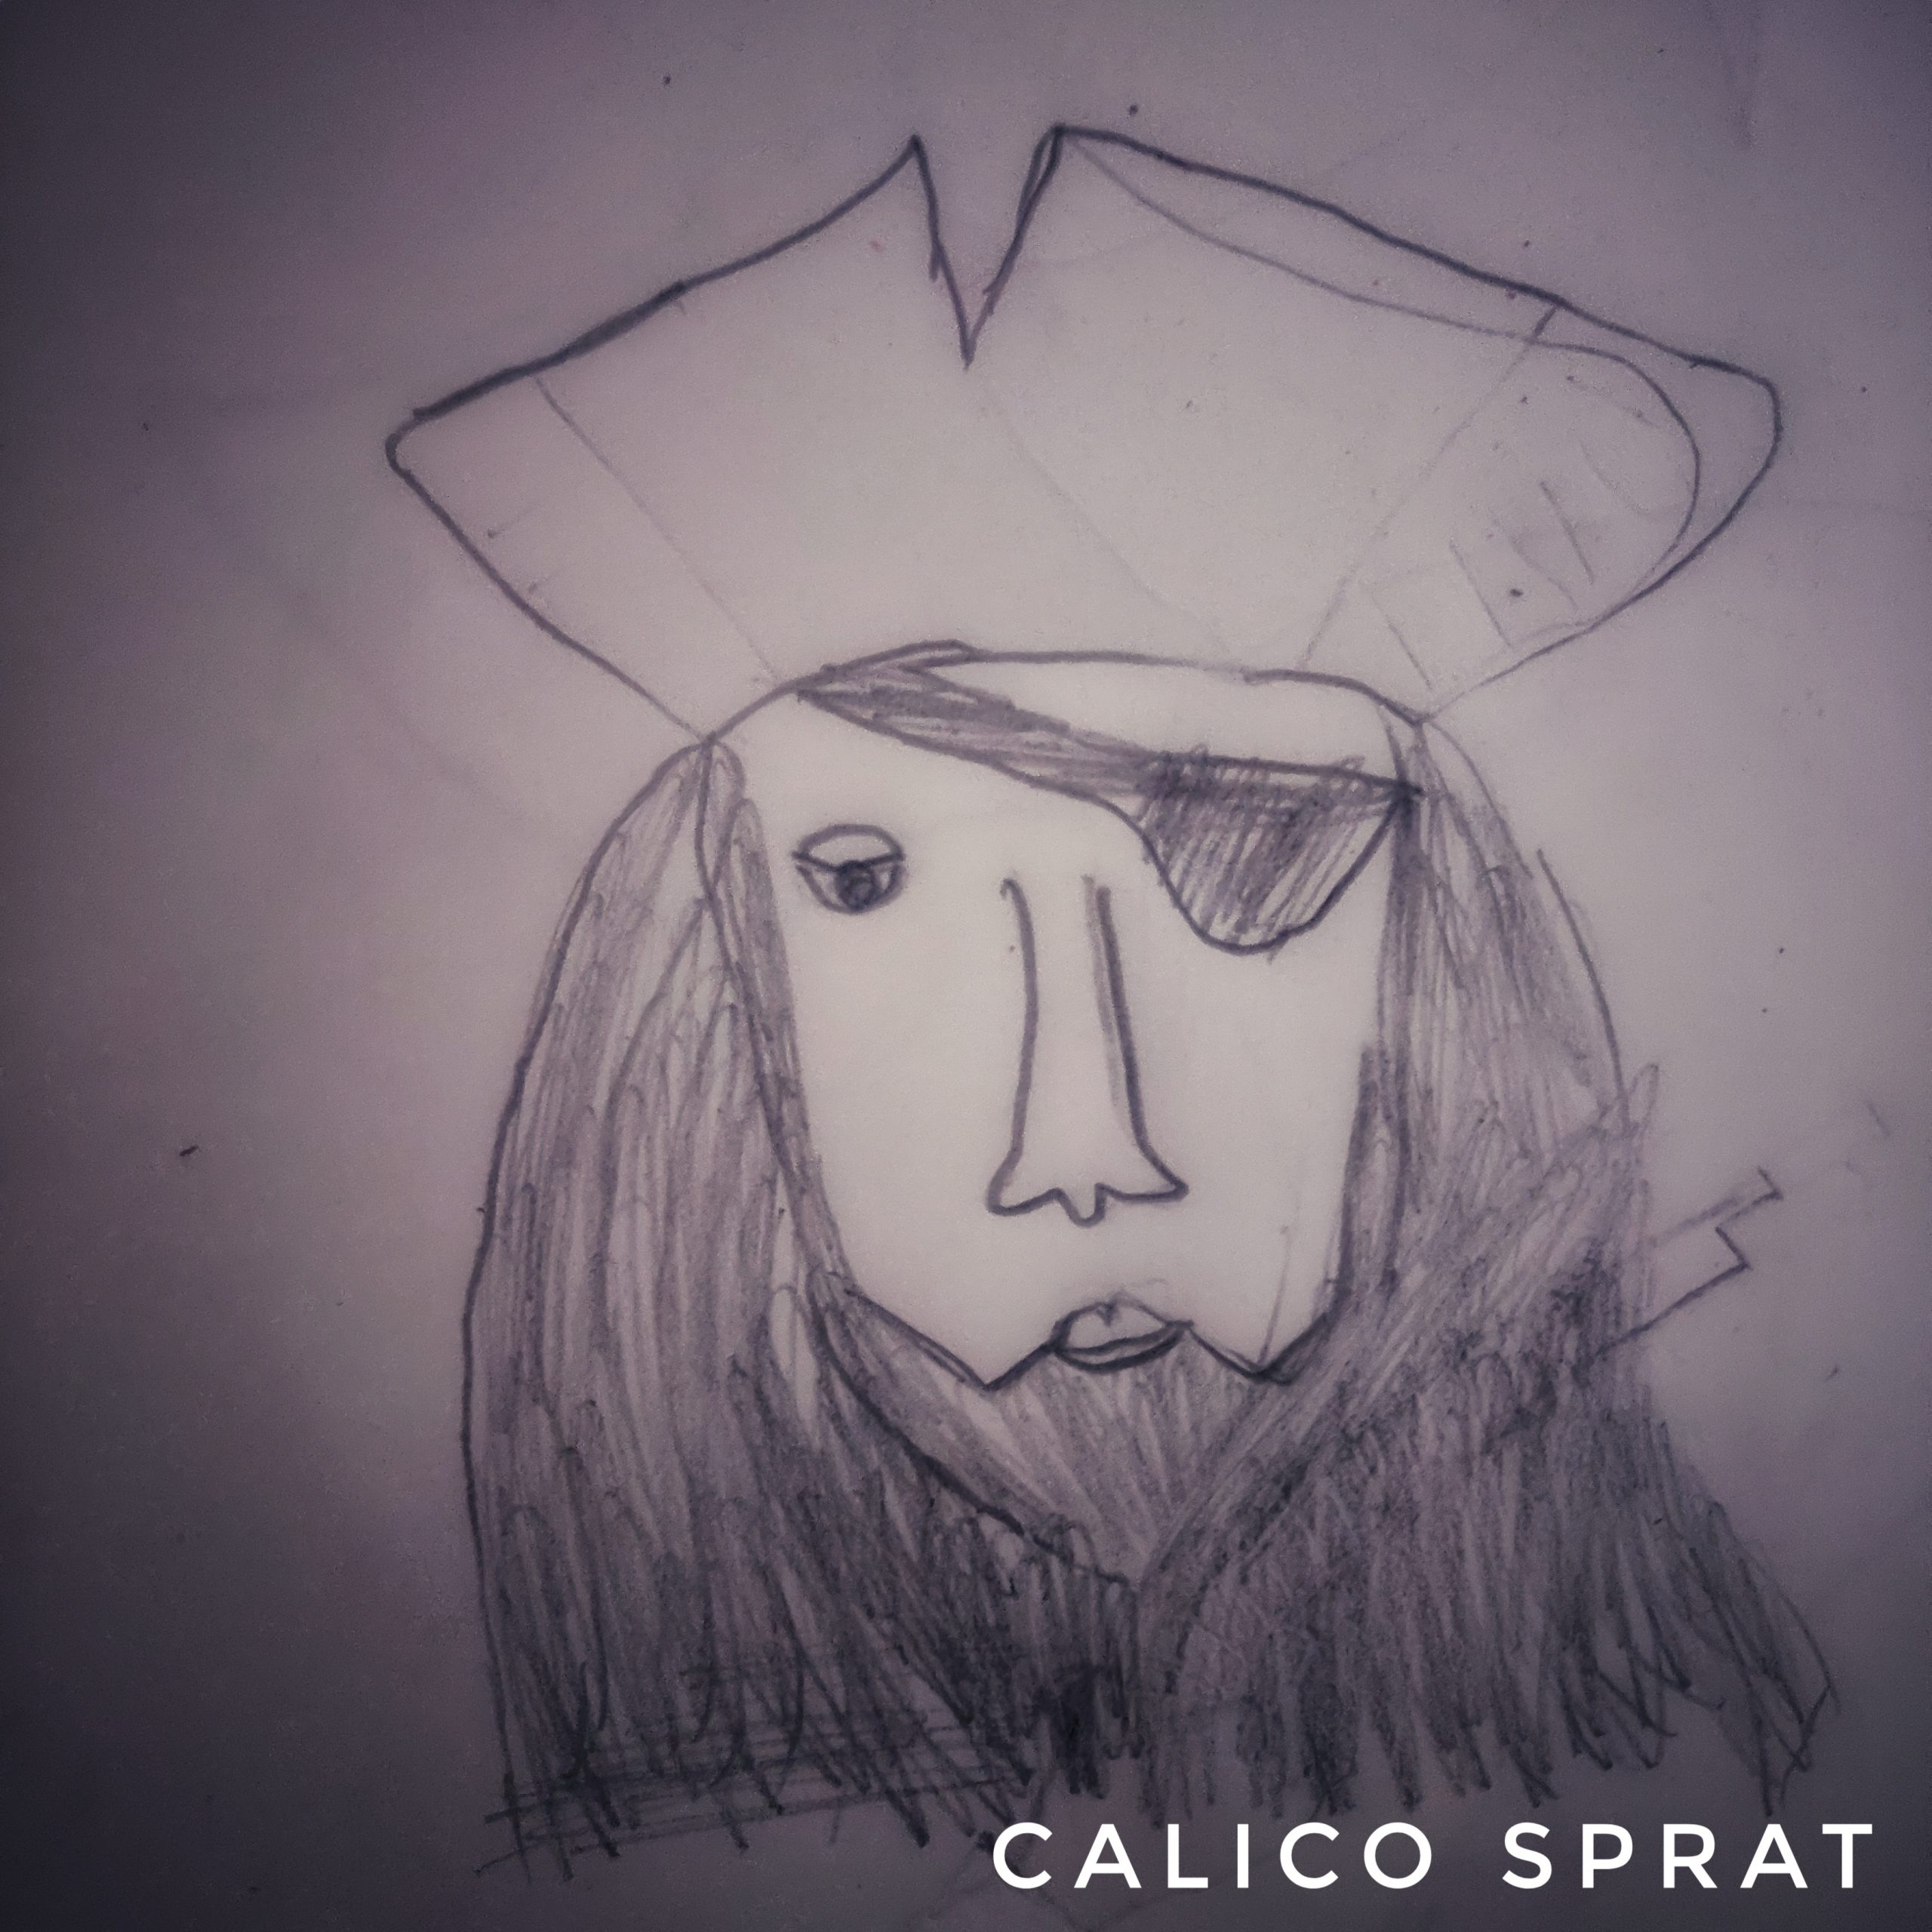 The Adventures of Calico Sprat-Part 2